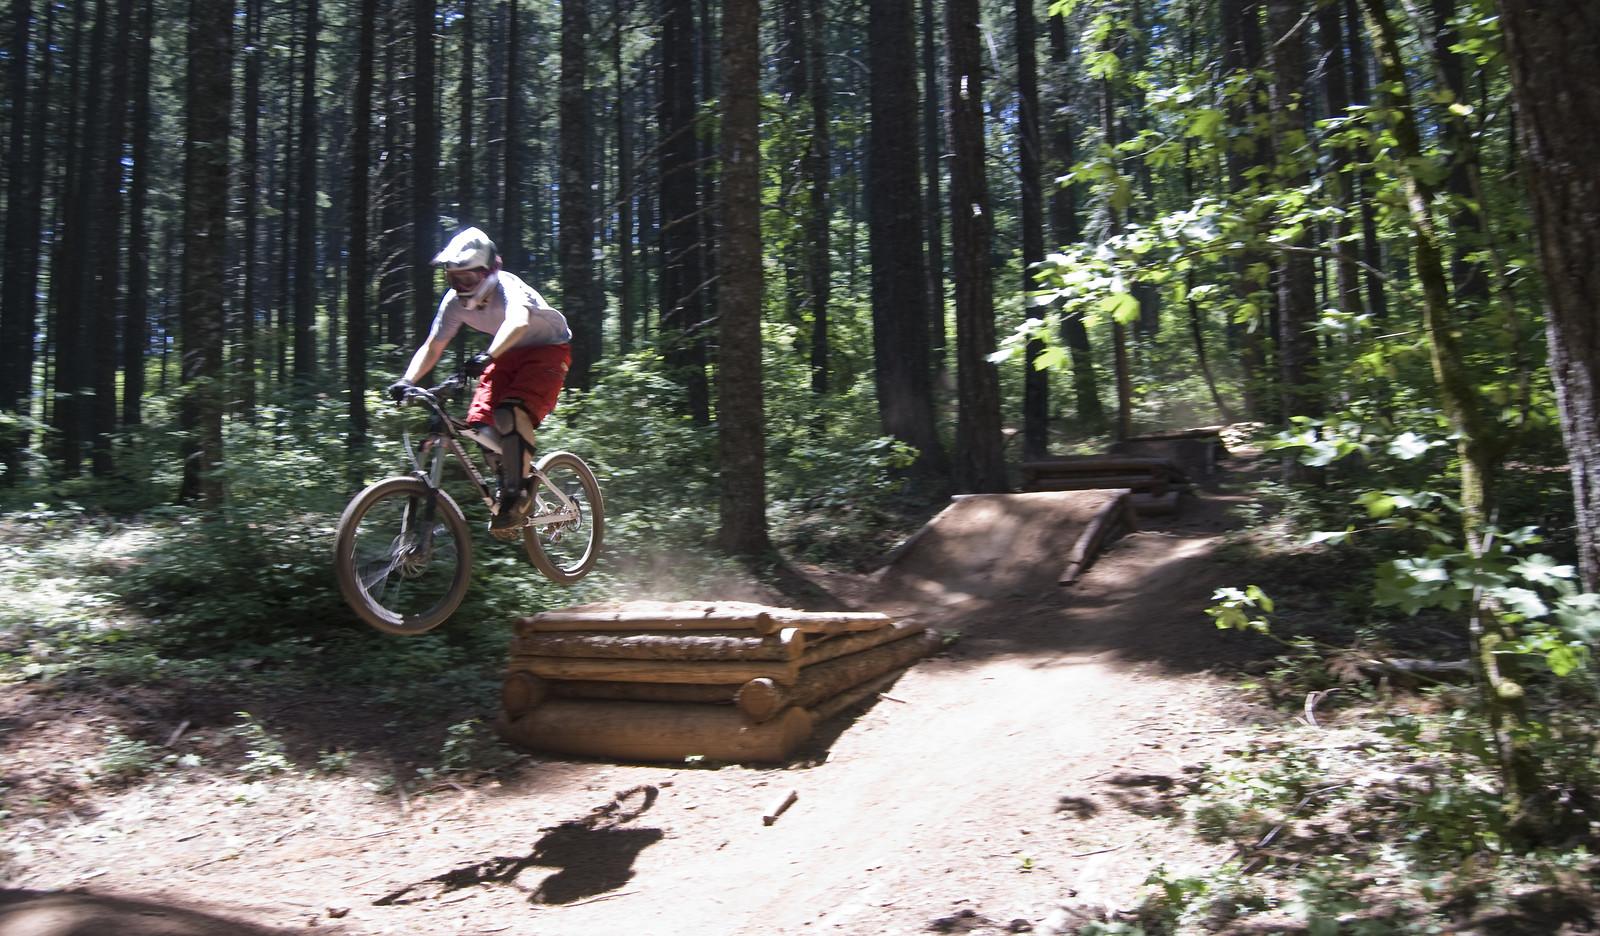 Extended Play - ryan_daugherty - Mountain Biking Pictures - Vital MTB